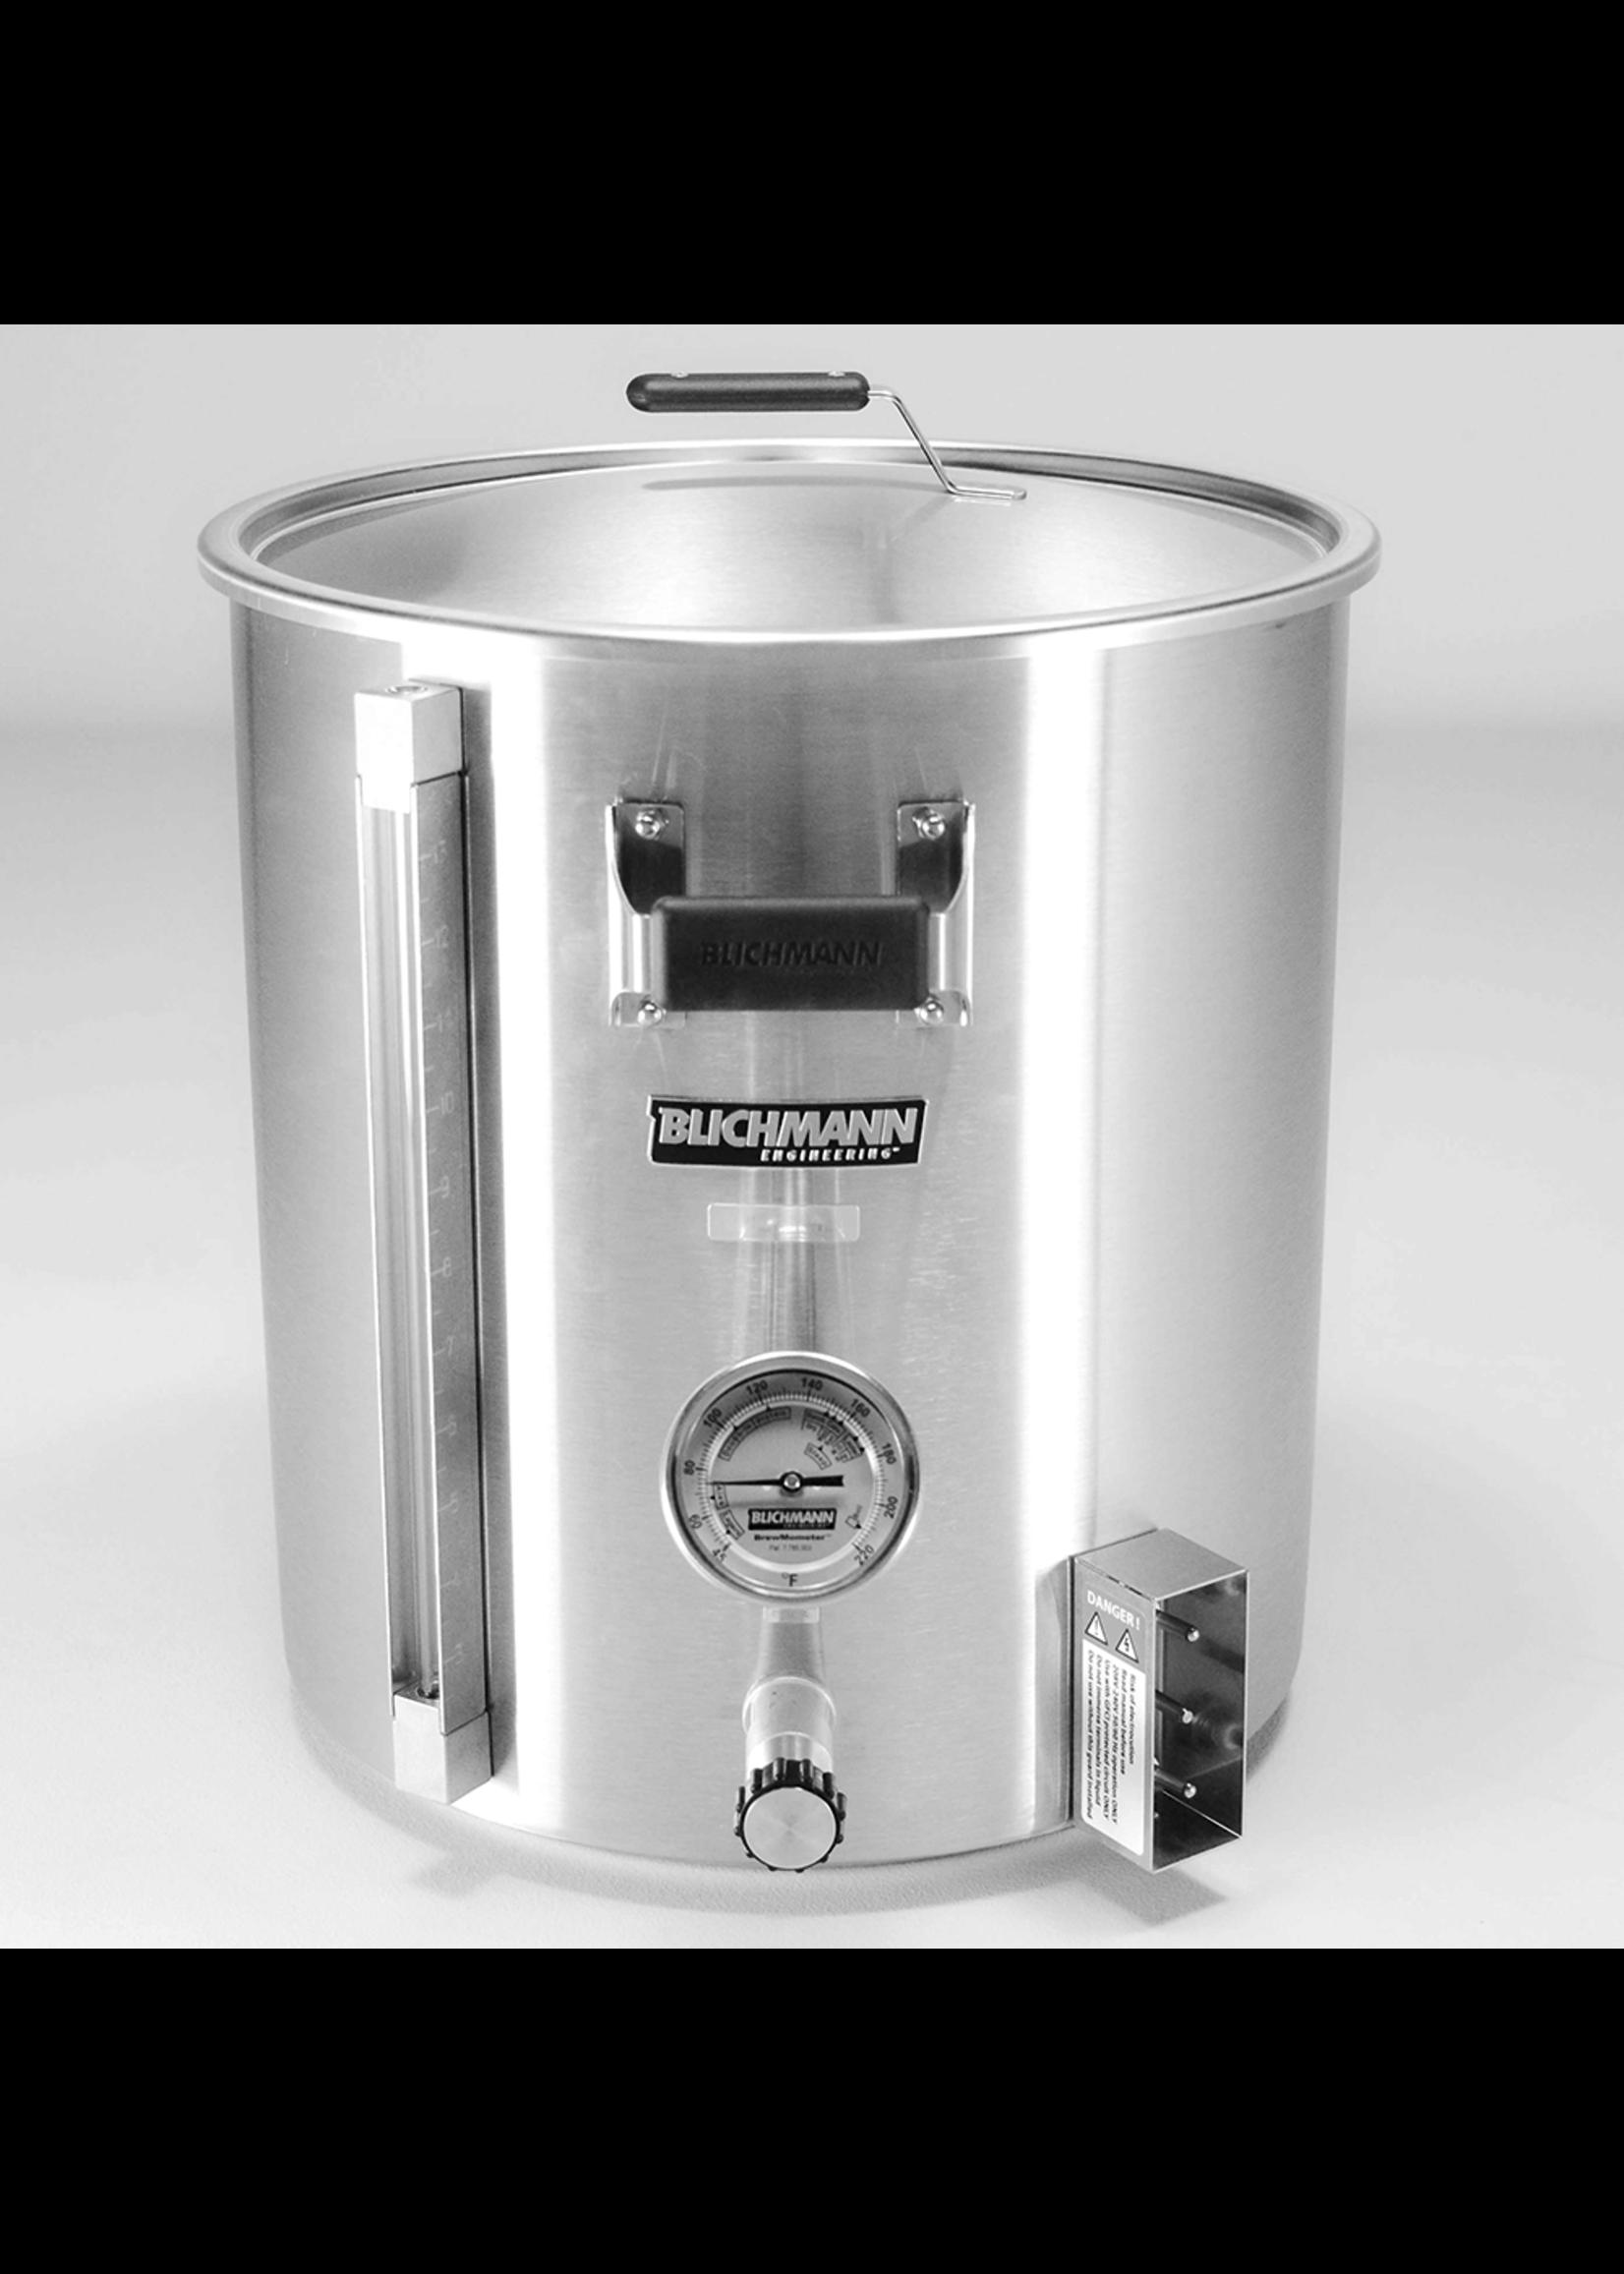 Blichmann Blichmann BoilerMaker G2 - 10 Gallon 240V Electric Brew Kettle (Celsius)